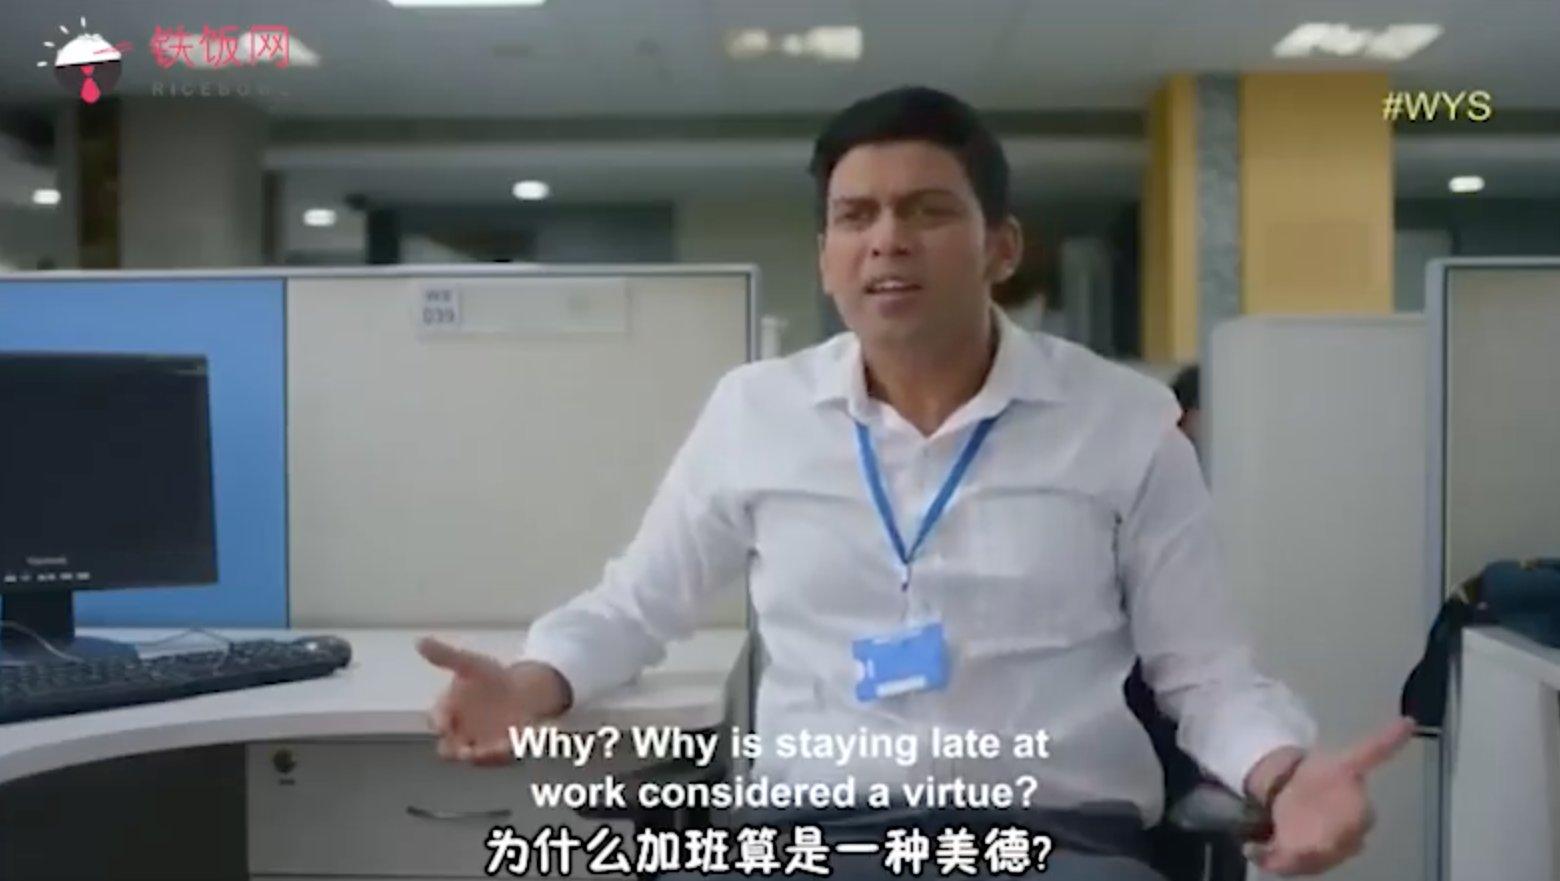 4 7.png?resize=1200,630 - 還在辦公室加班ing?快拿這段影片去打臉老闆...拿回對人生的主控權阿!